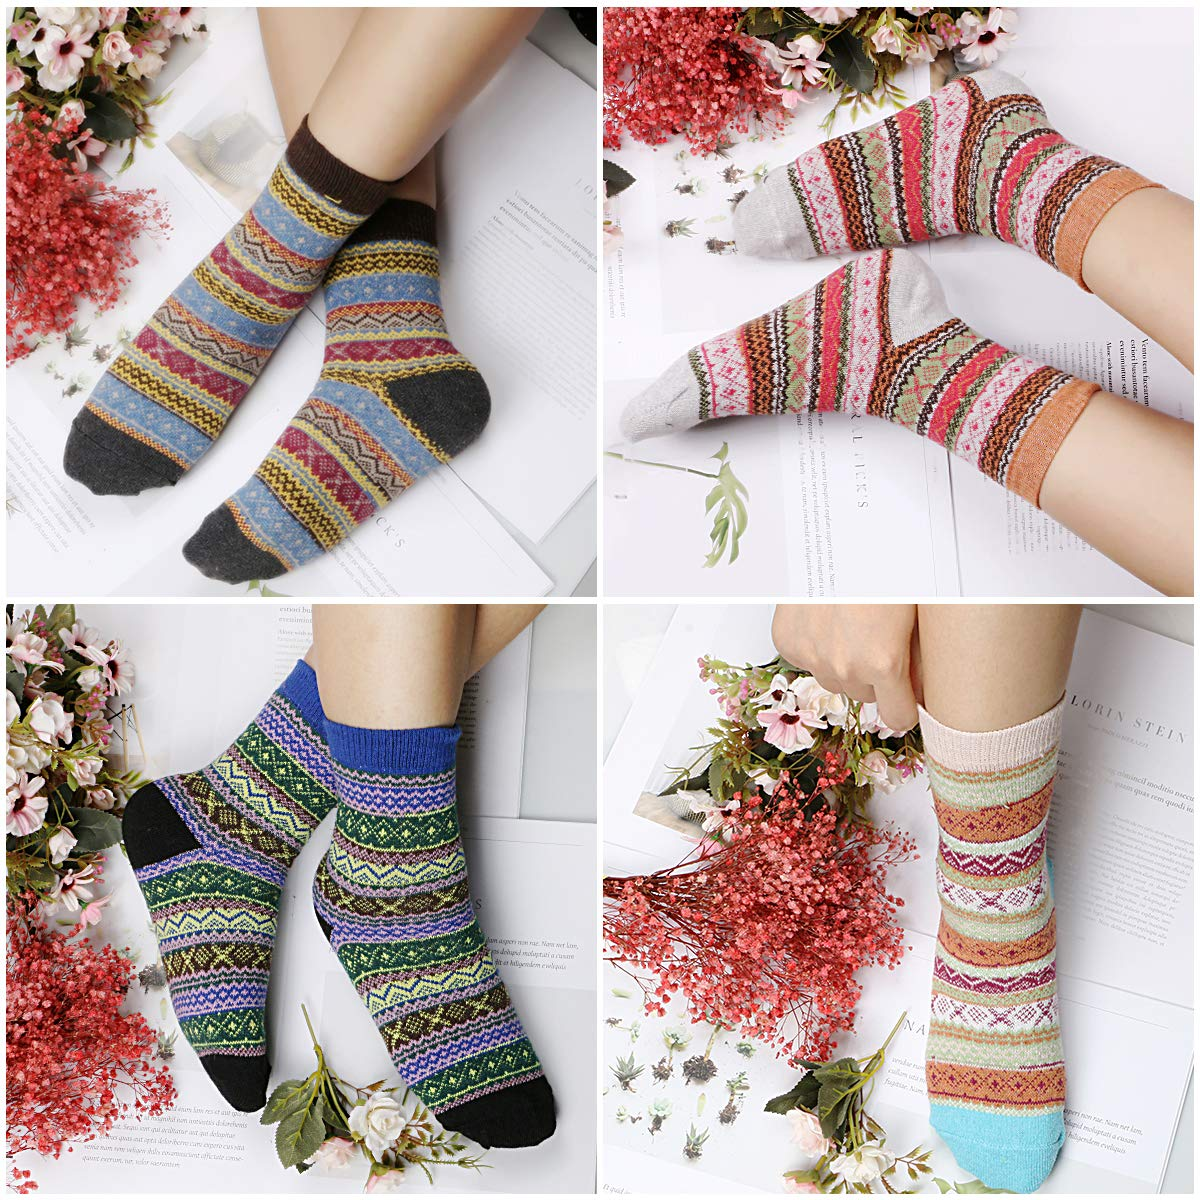 Philonext Calcetines para mujer de 6 pares - calcetines de lana ...